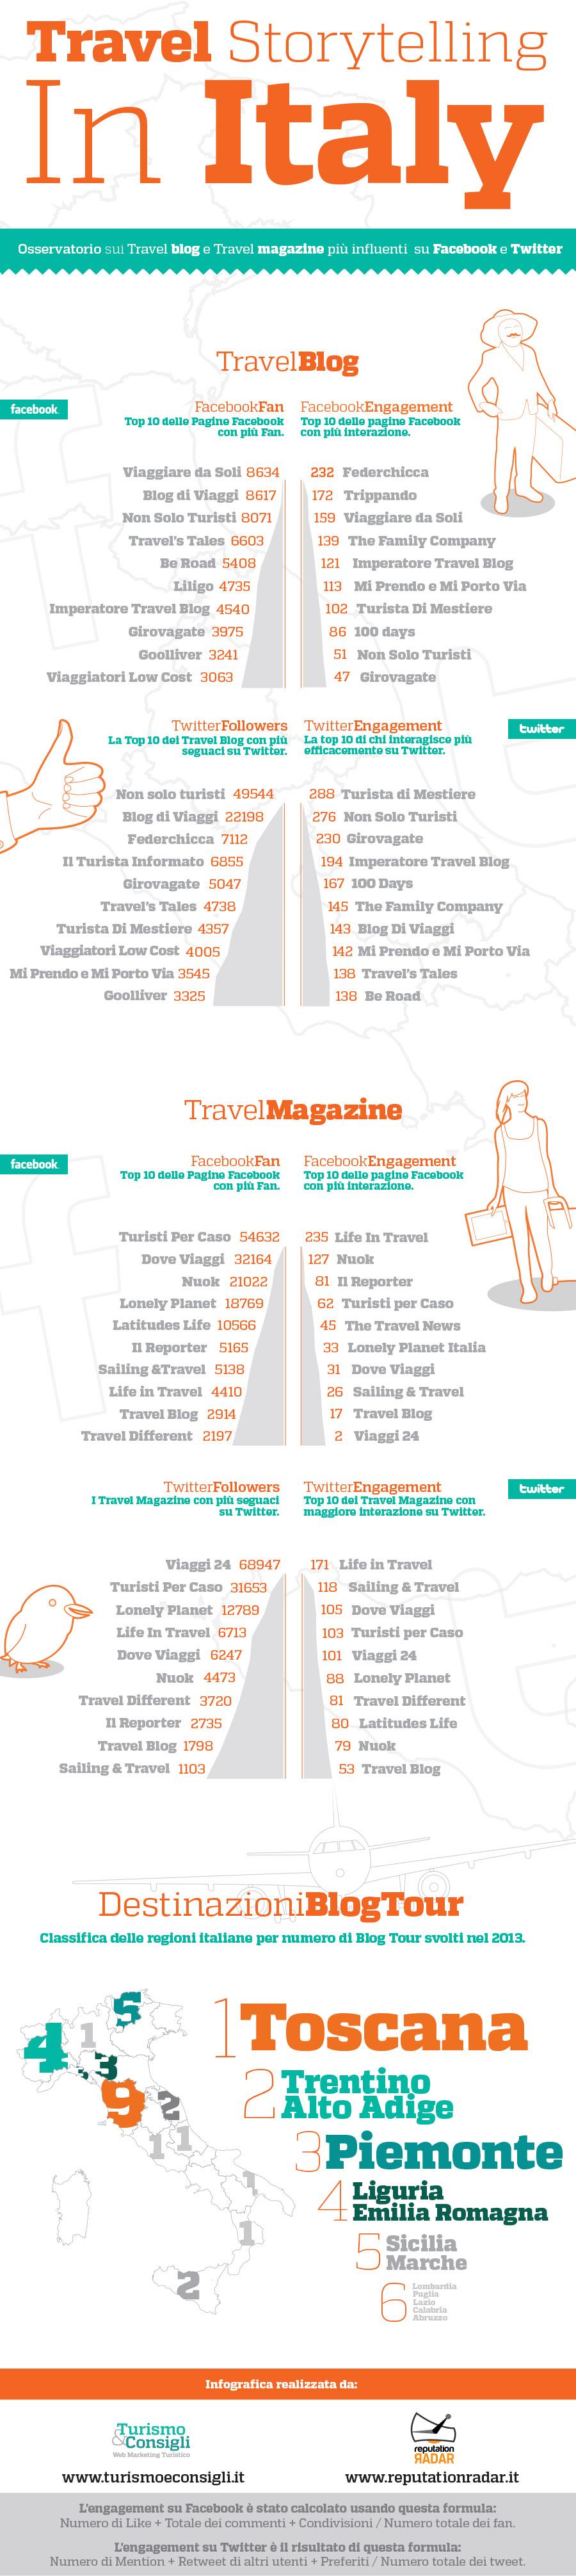 travelblog_infografica-low